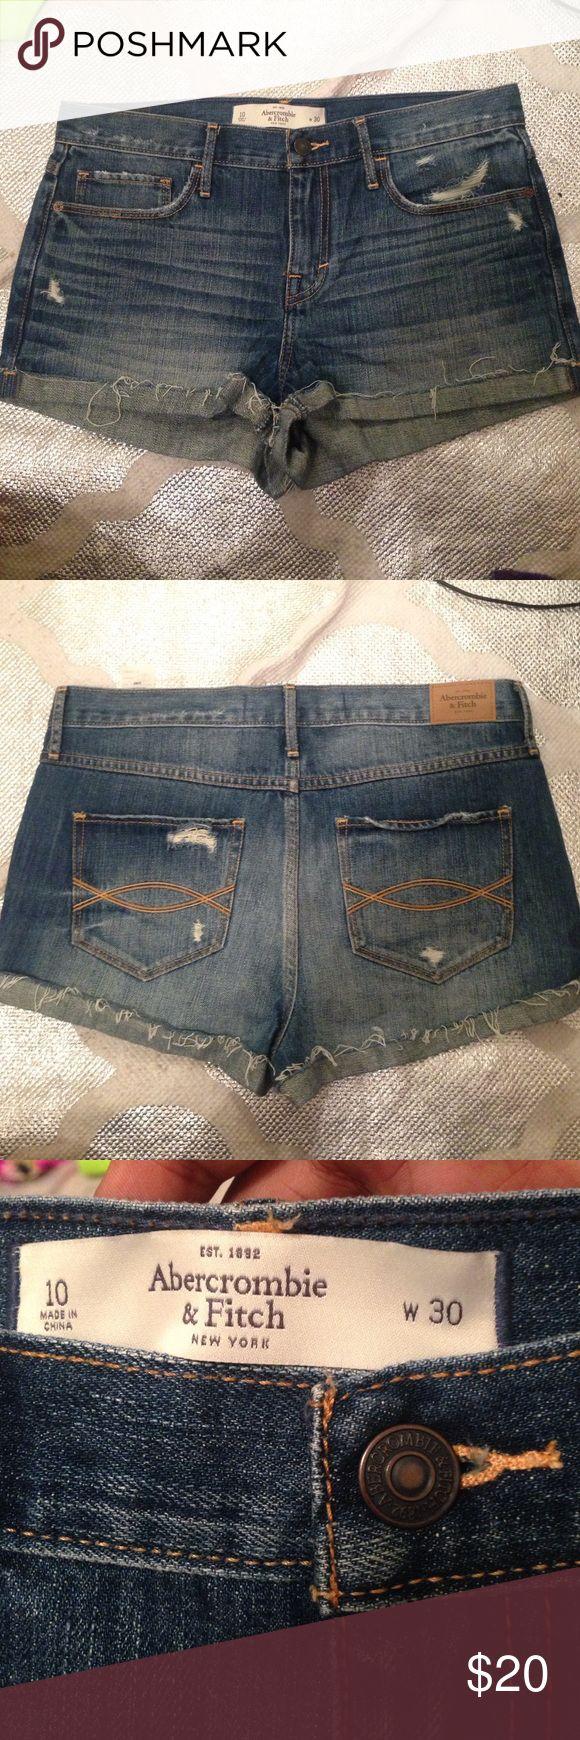 🙄LAST CALL🆕Abercrombie & fitch denim shorts 🆕Abercrombie & fitch denim shorts    New without tags   Size 10 Waist 30 Inseam 1.5 inches Abercrombie & Fitch Shorts Jean Shorts